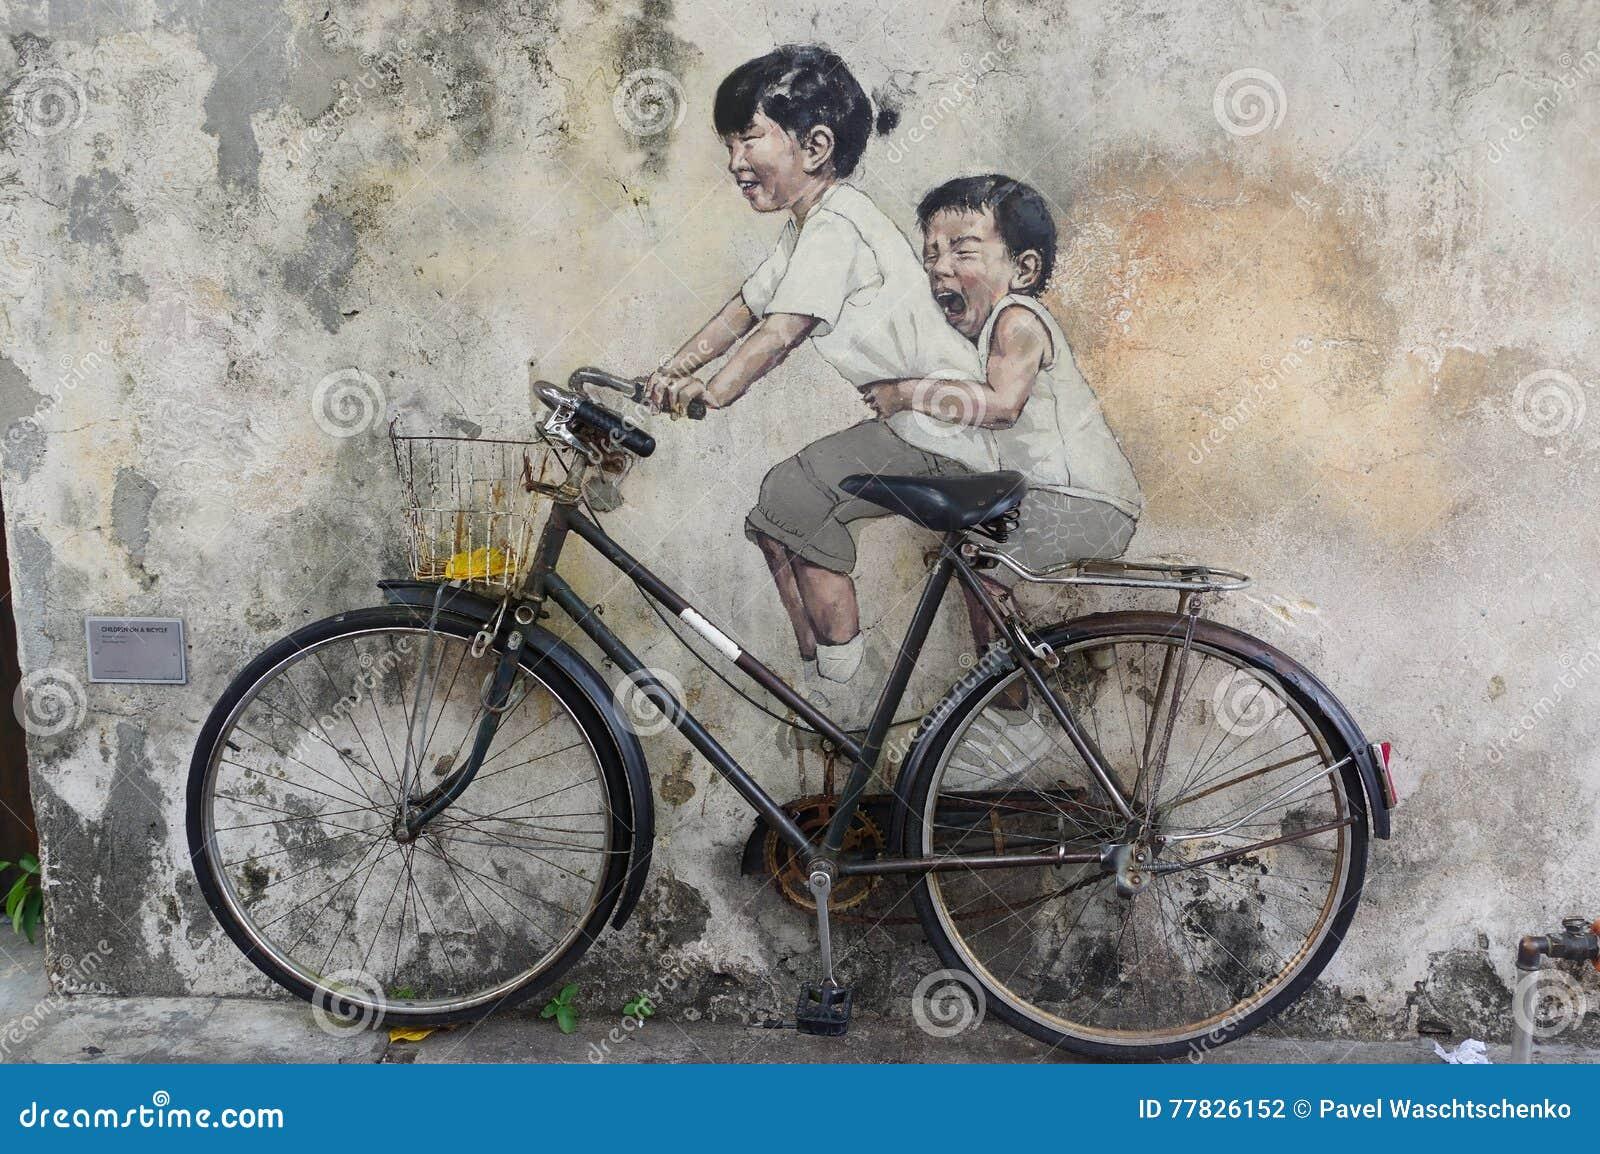 George Town, Penang, Malaisie - 18 avril 2016 : Petits enfants